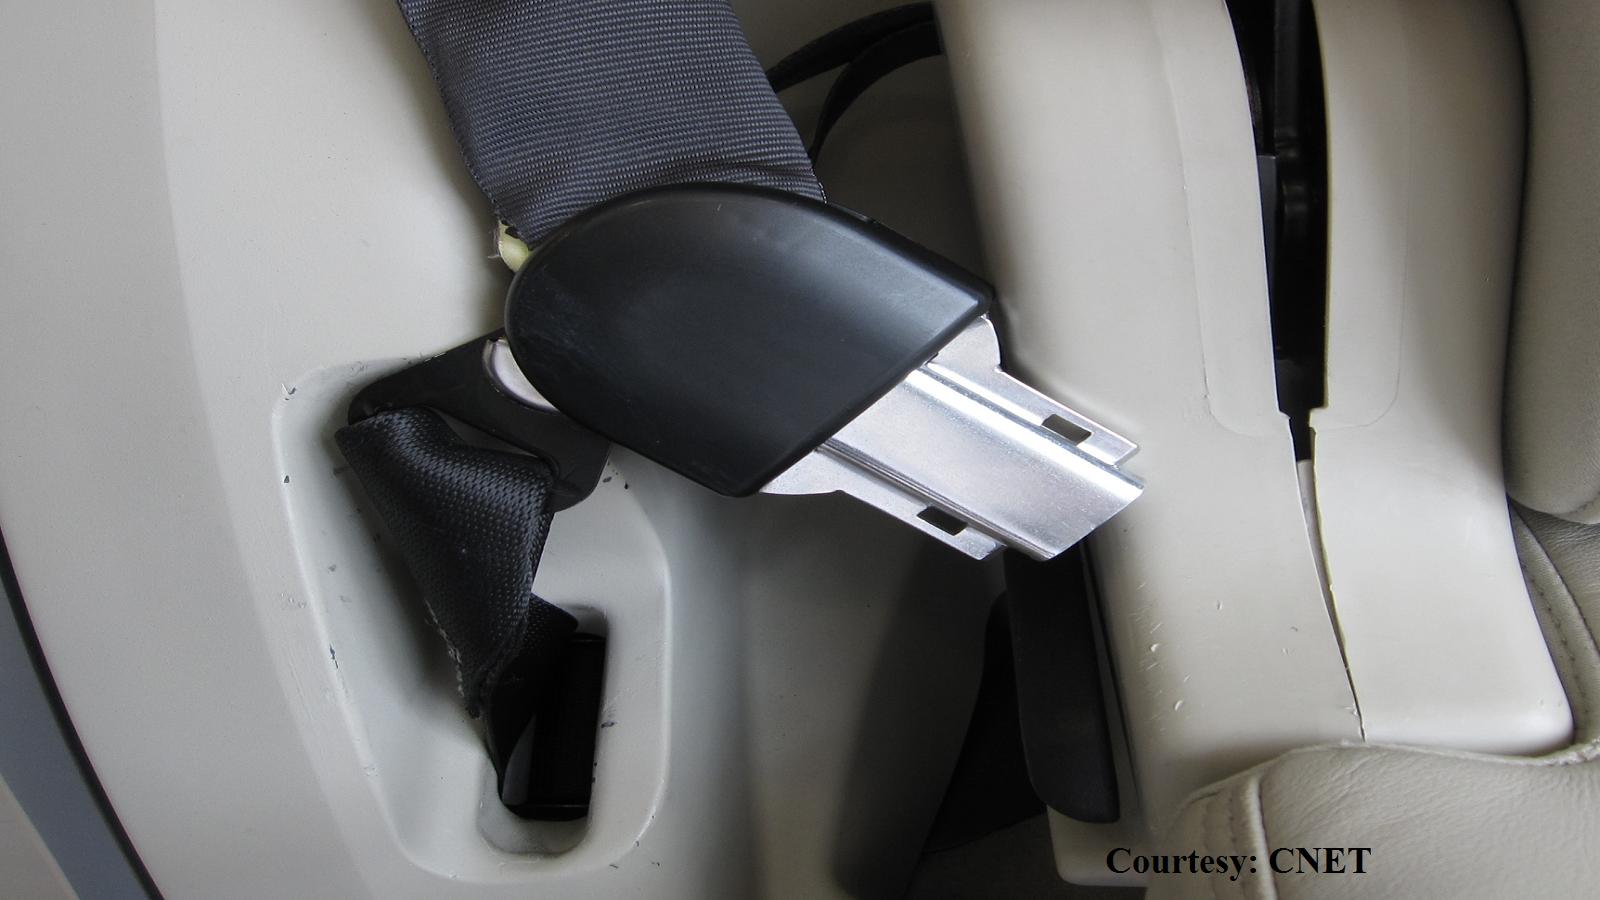 Seatbelt alarm deactivation